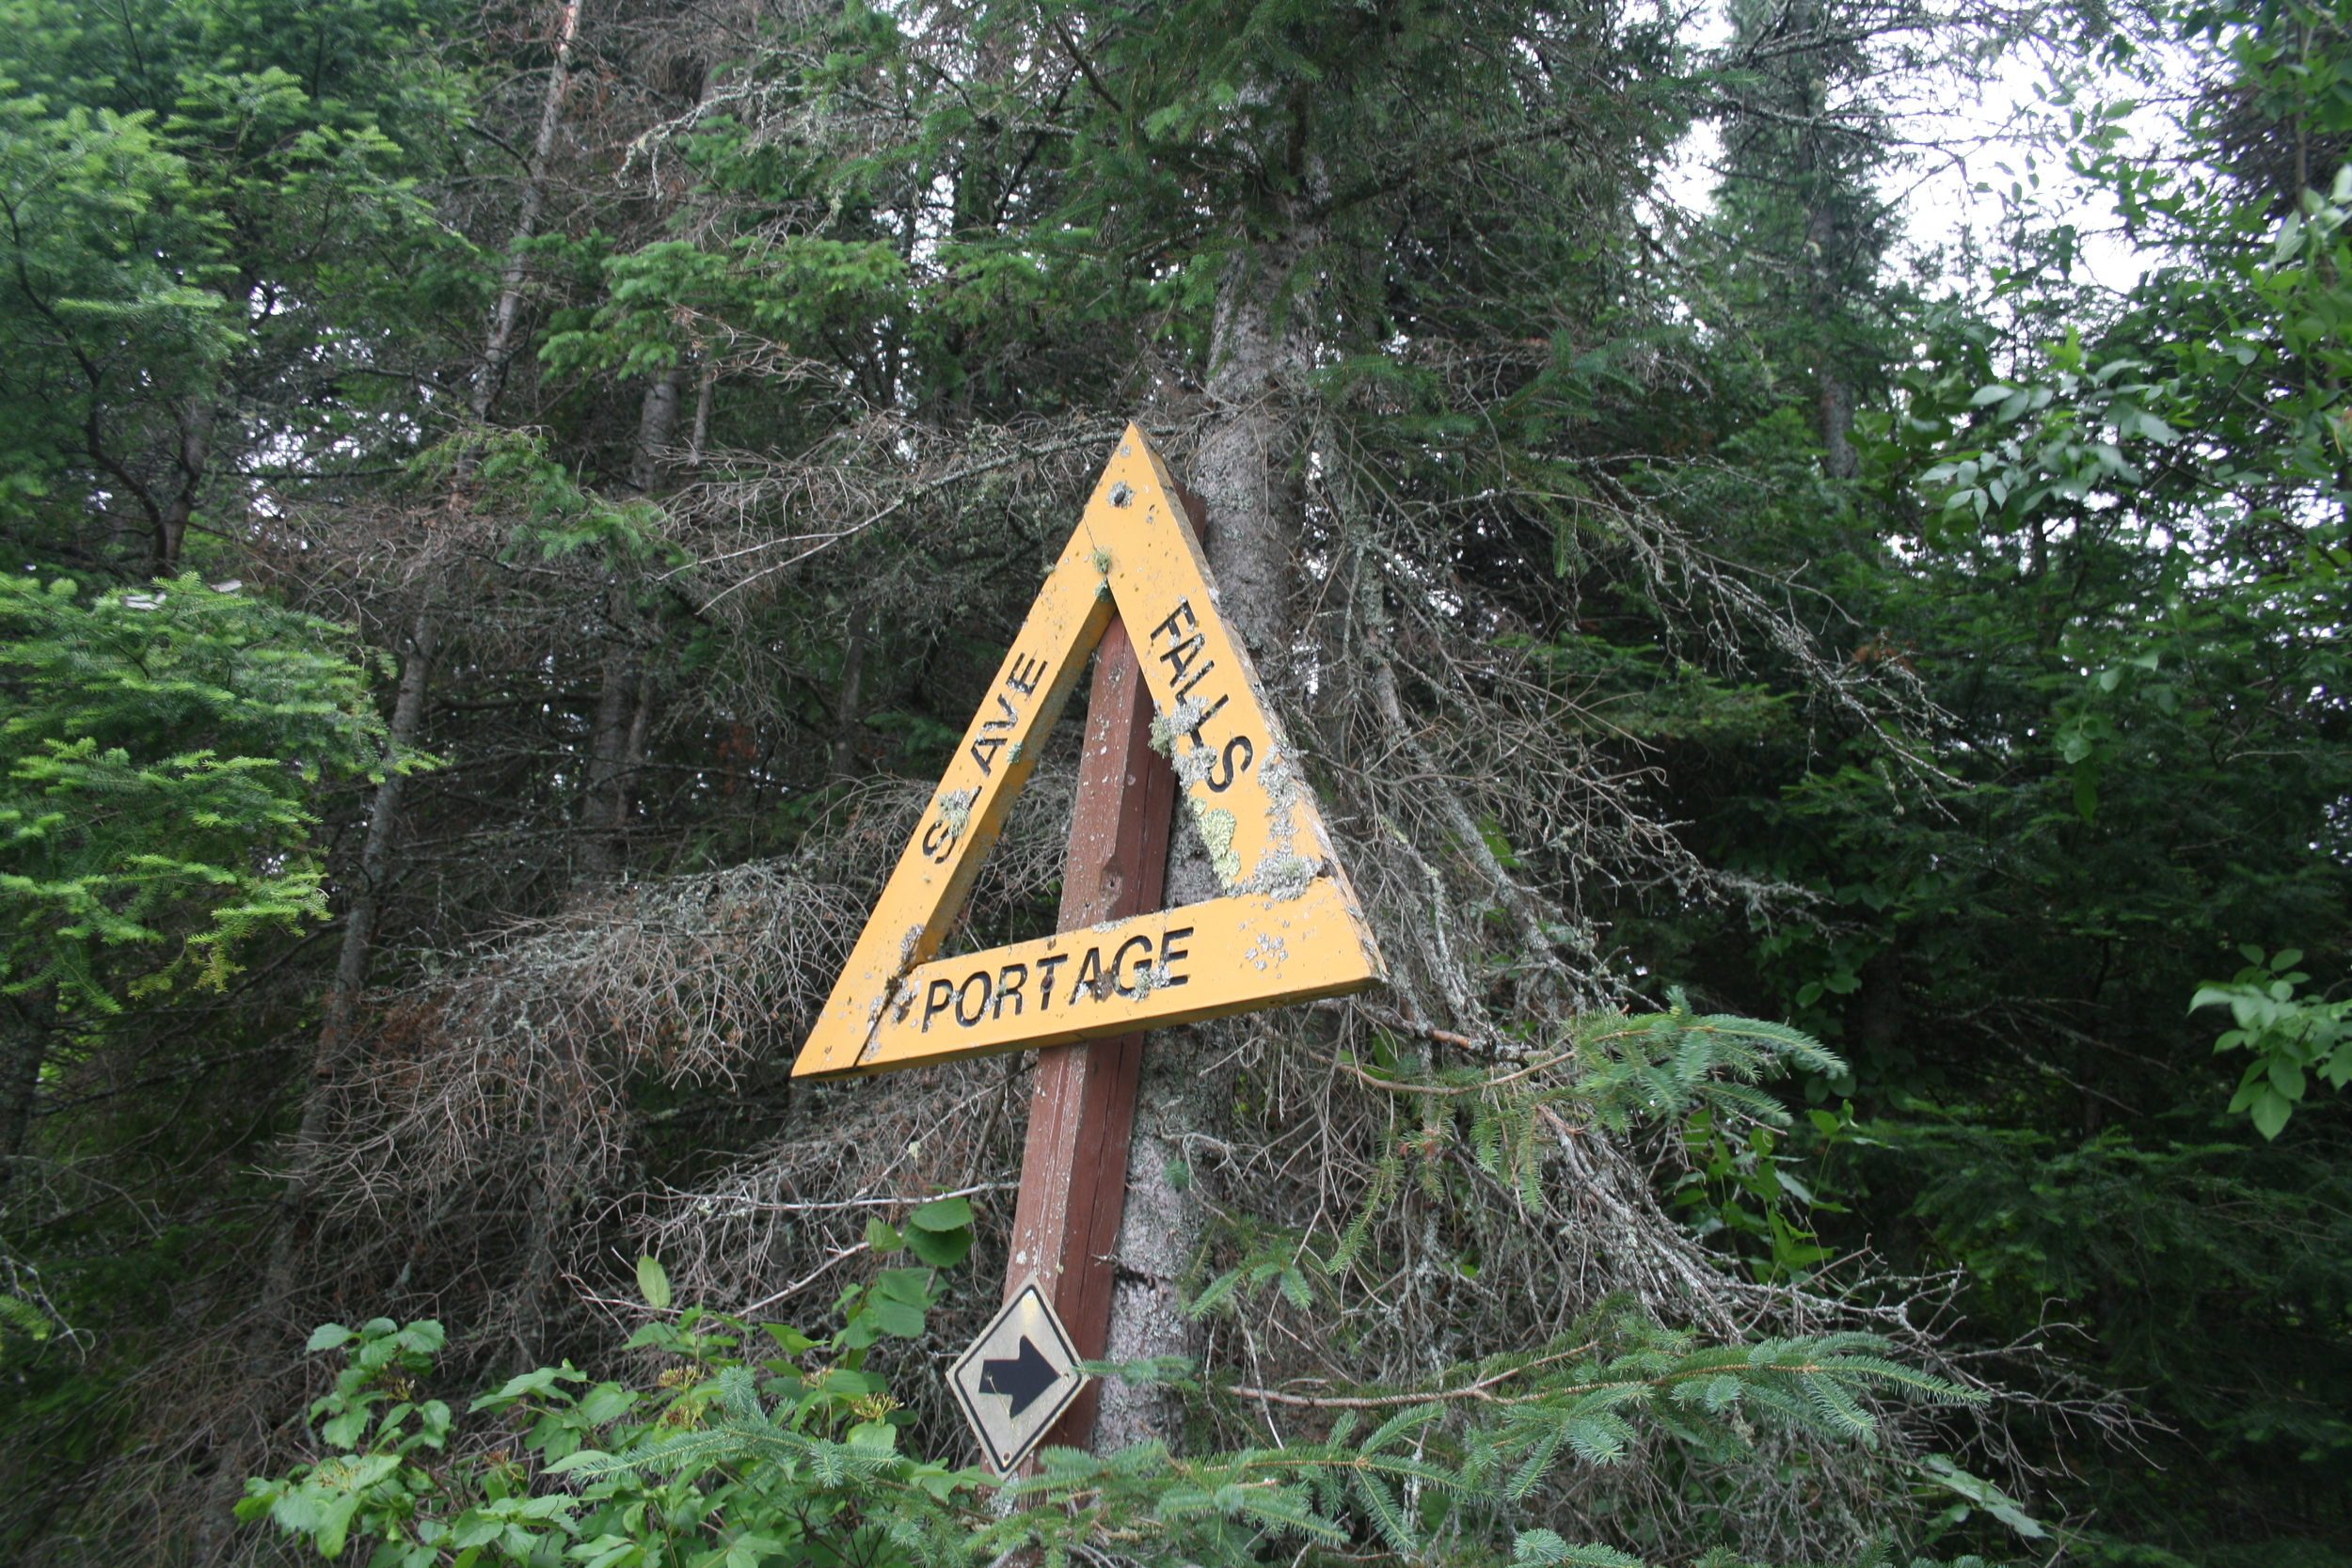 Pine Falls Portage